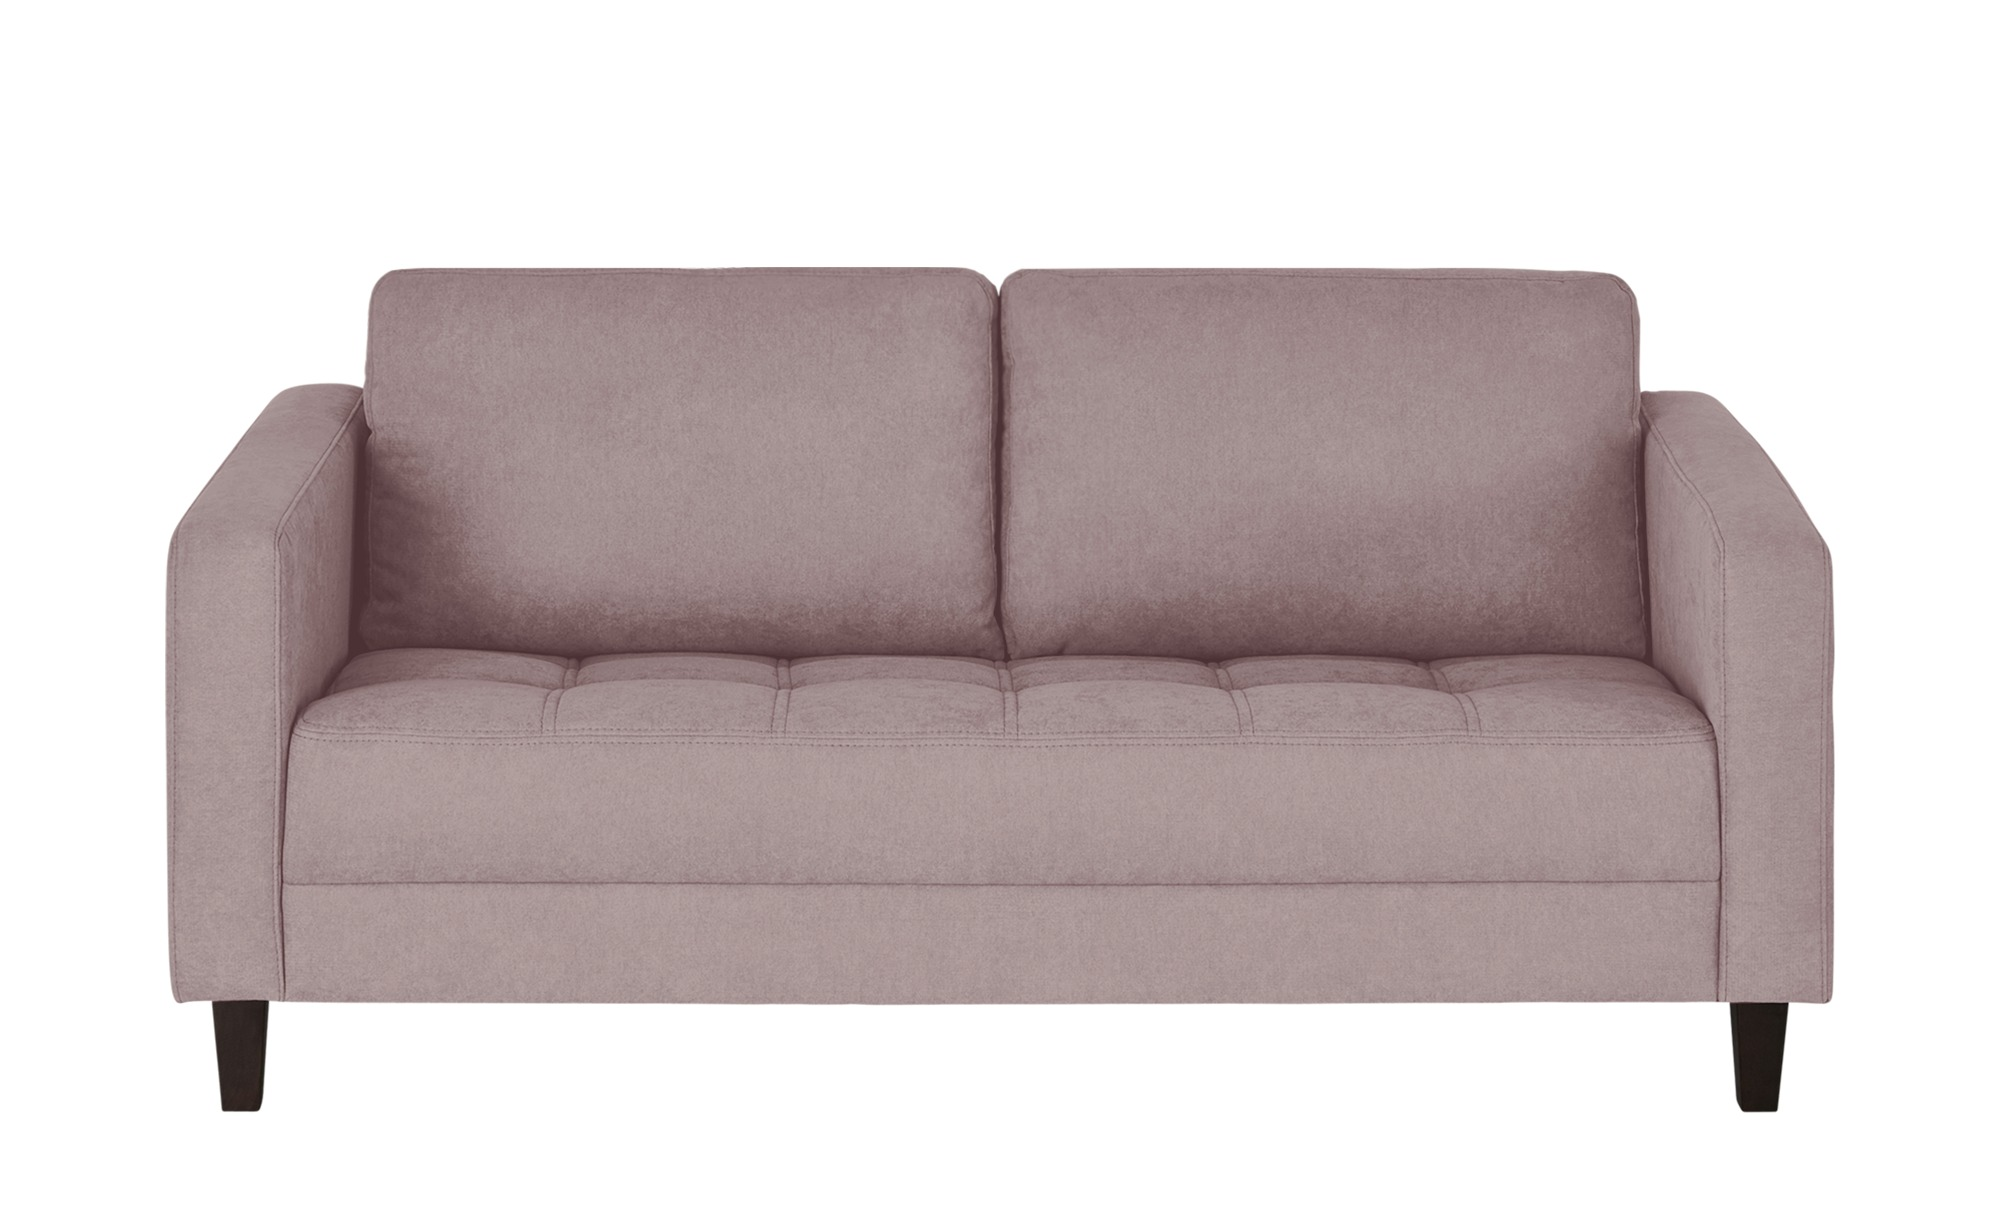 smart Sofa  Geradine ¦ rosa/pink ¦ Maße (cm): B: 177 H: 93 T: 92 Polstermöbel > Sofas > 2-Sitzer - Höffner